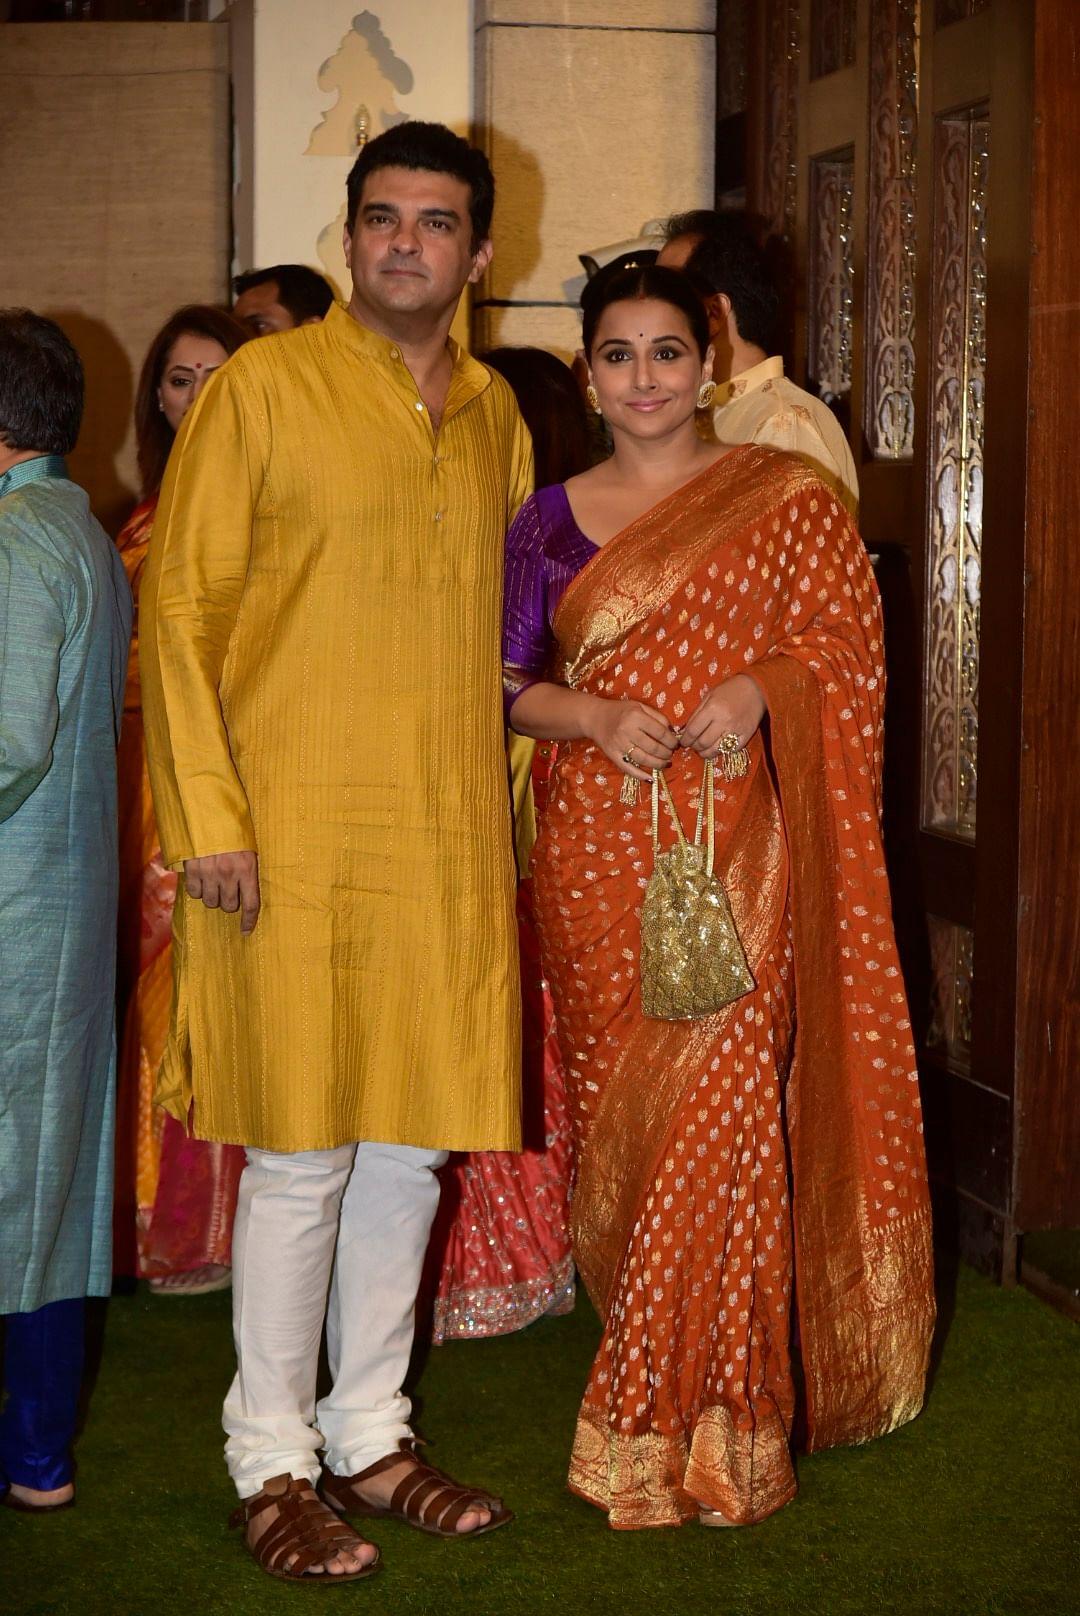 Vidya Balan with husband Siddharth Roy Kapur at Antilia Ganpati celebration